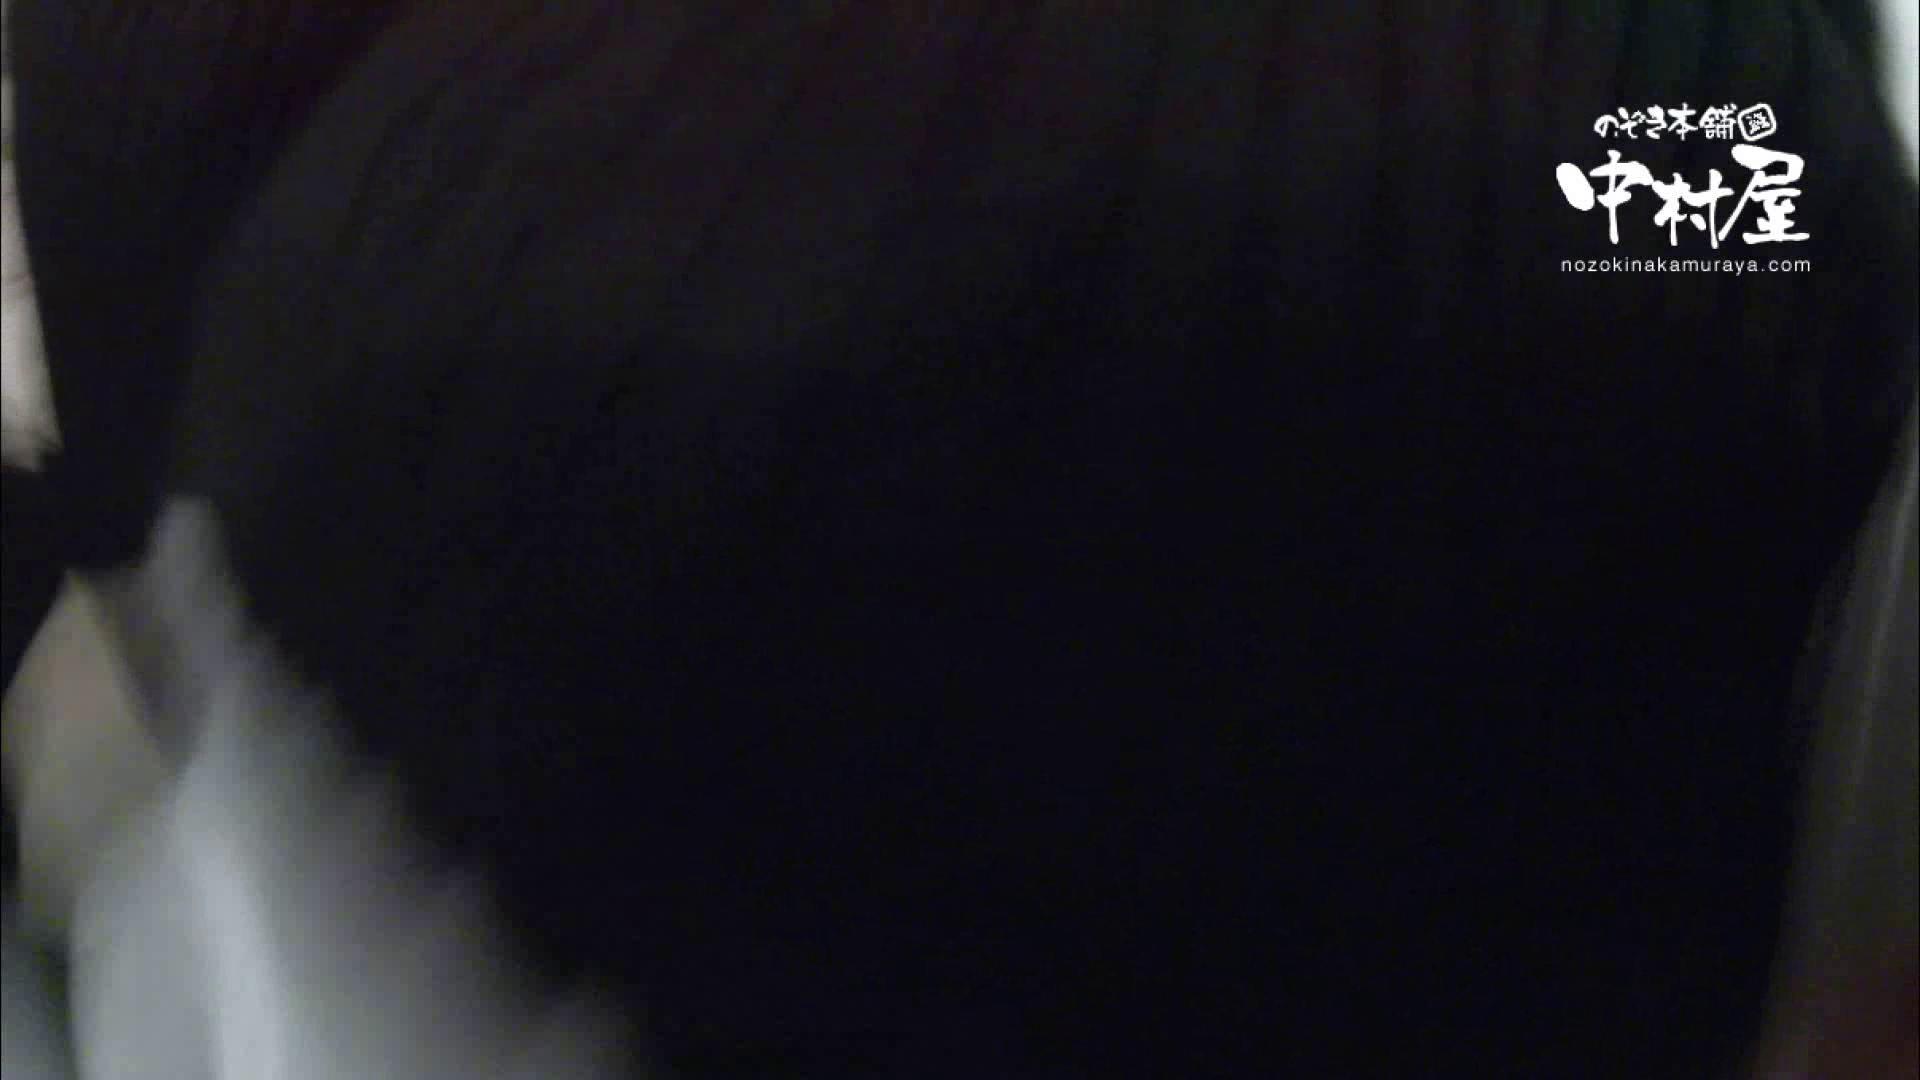 鬼畜 vol.03 イヤァー! 前編 鬼畜 | 0  79画像 4